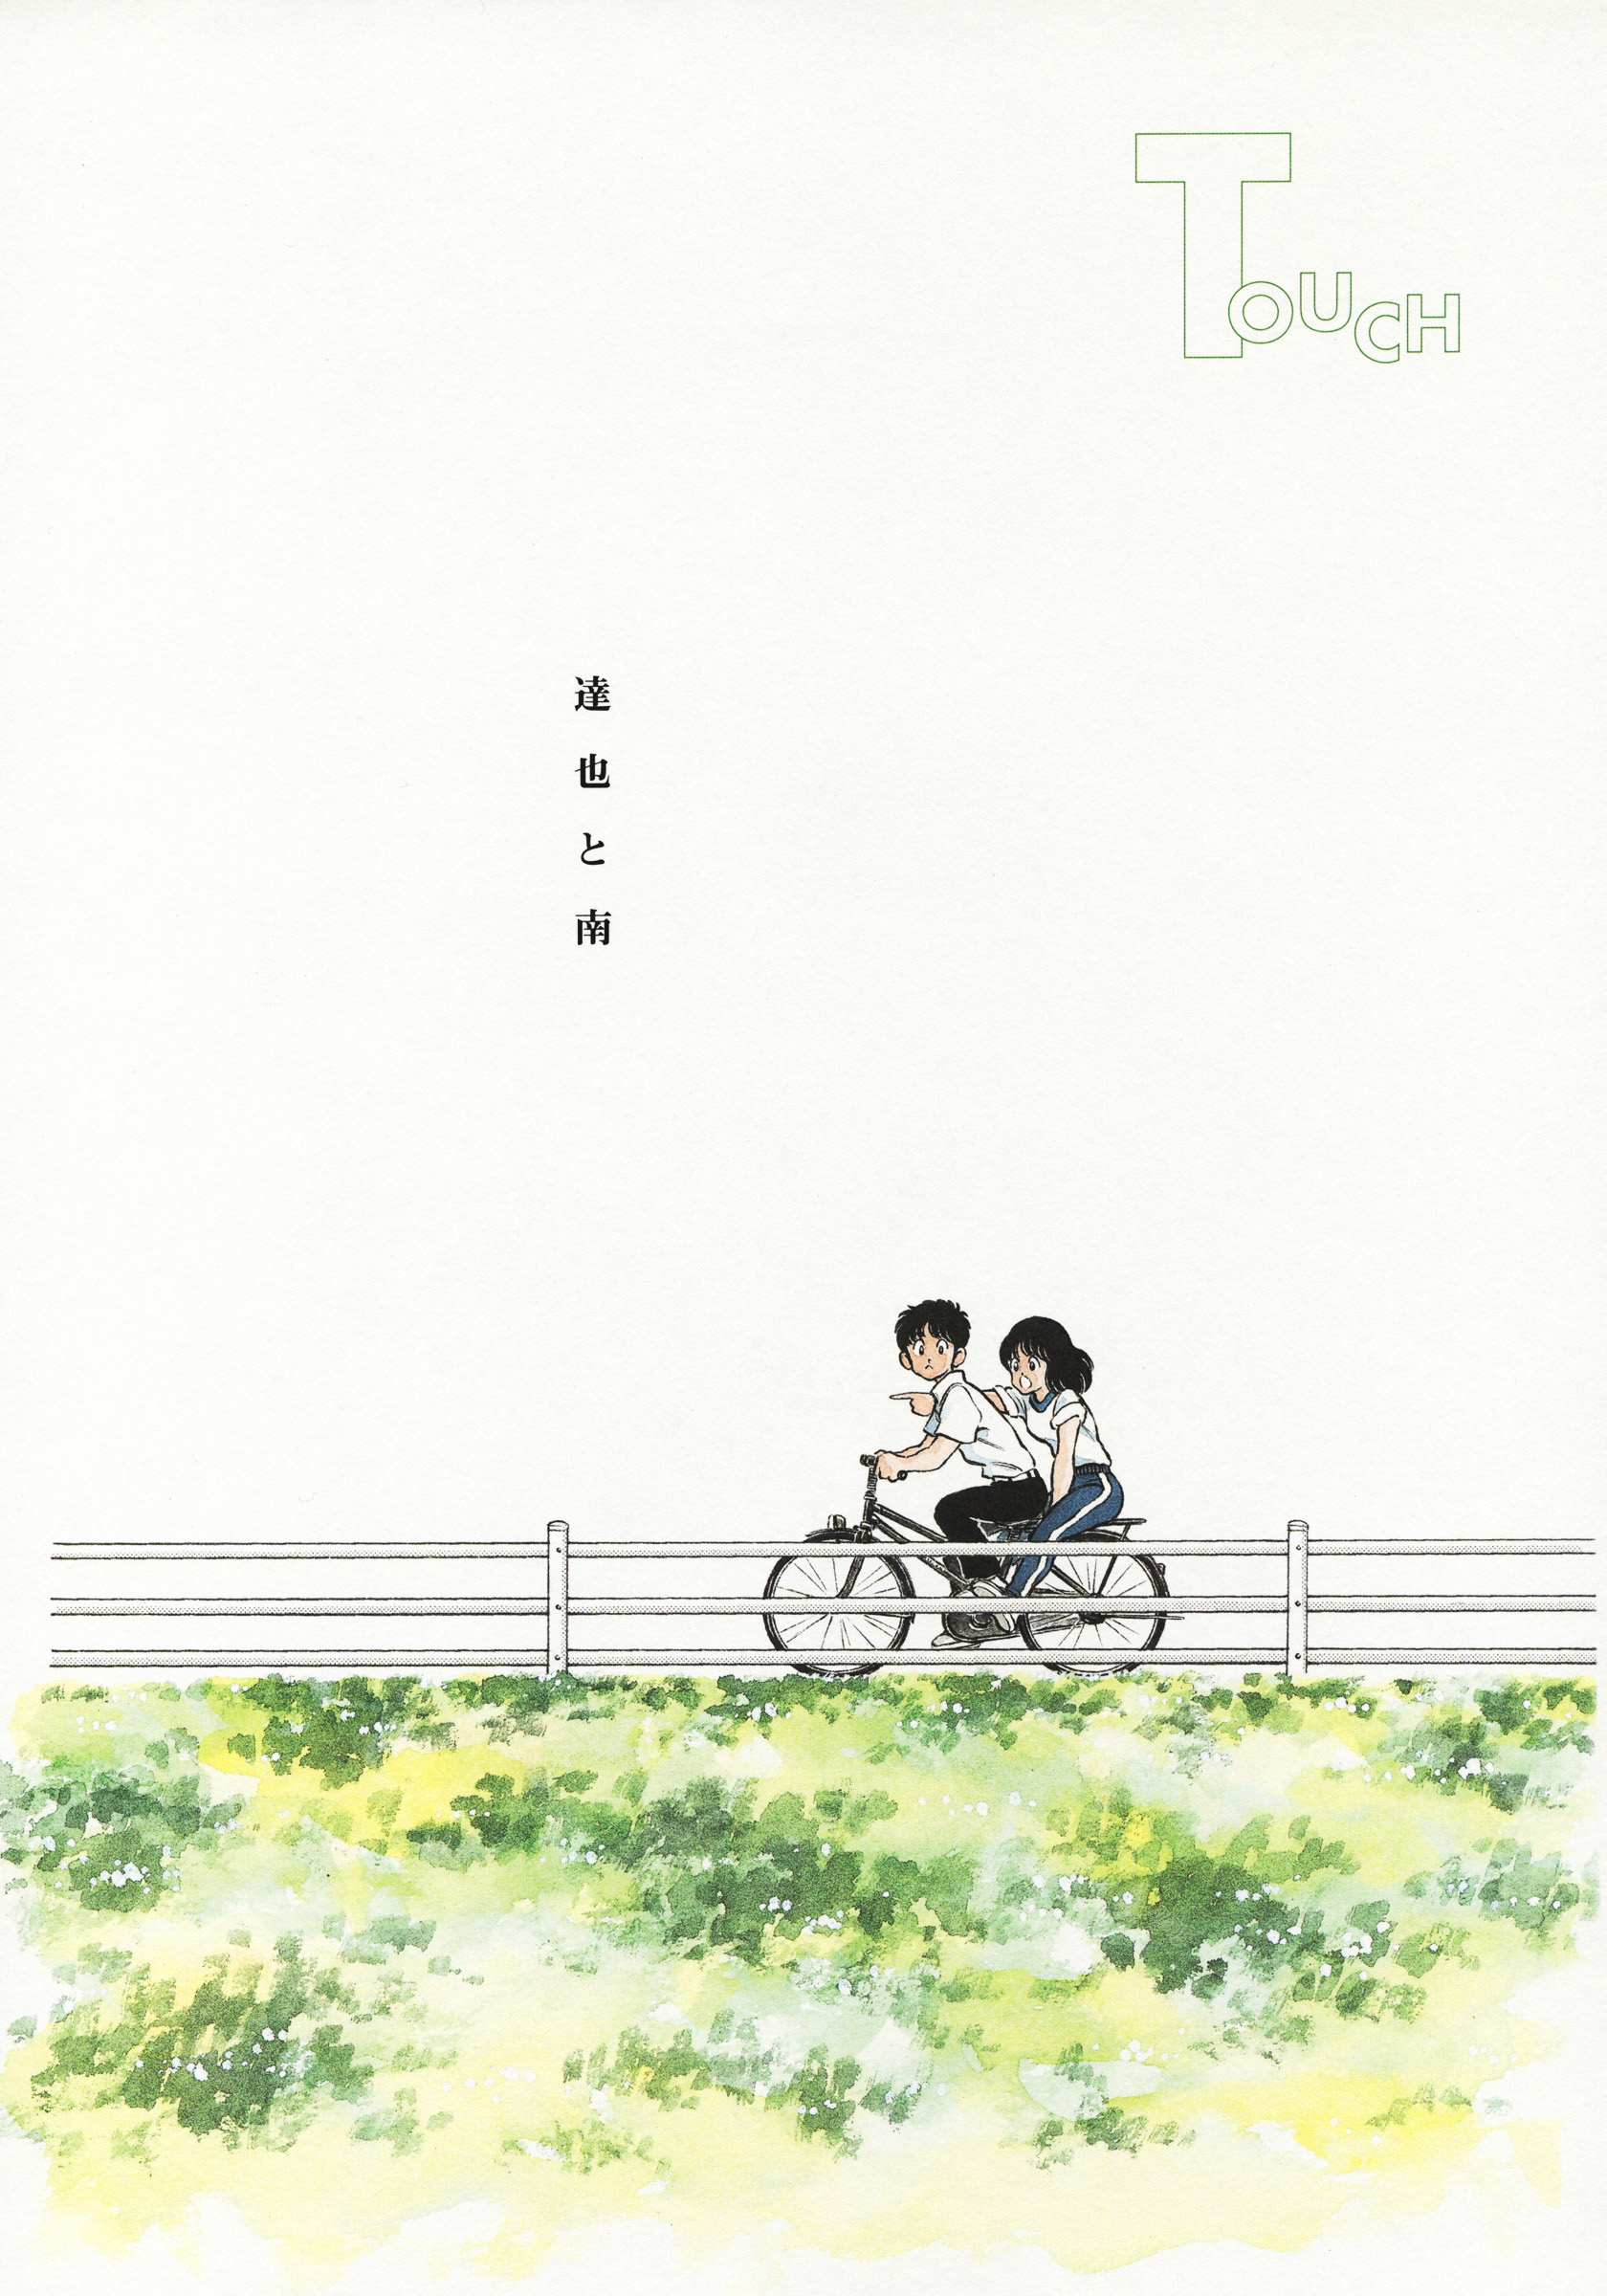 Adachi Mitsuru Zerochan Anime Image Board